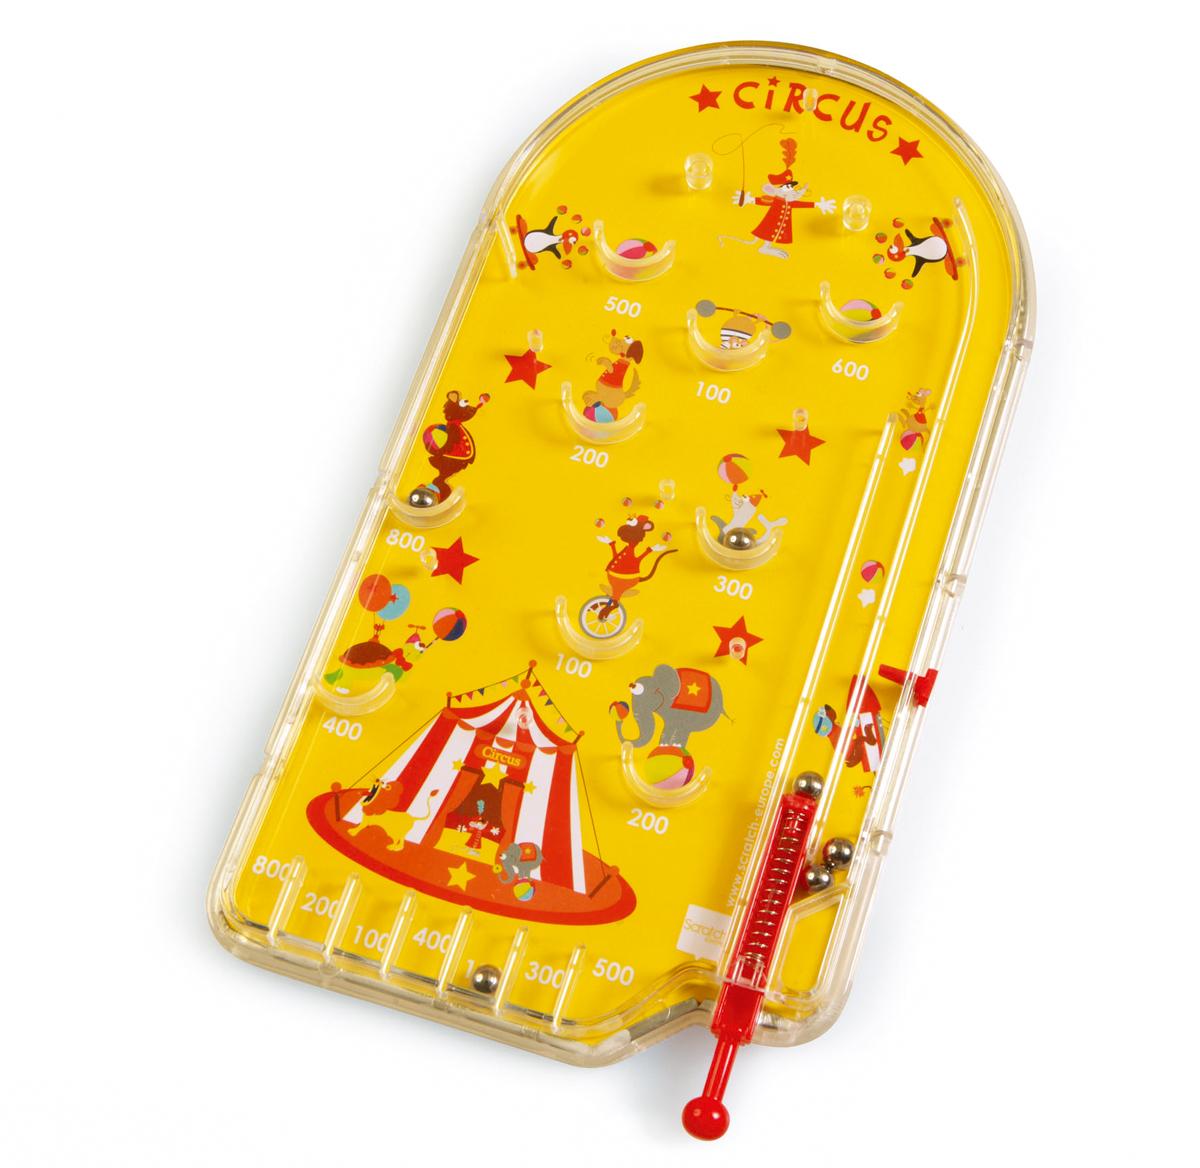 Pinball Circo